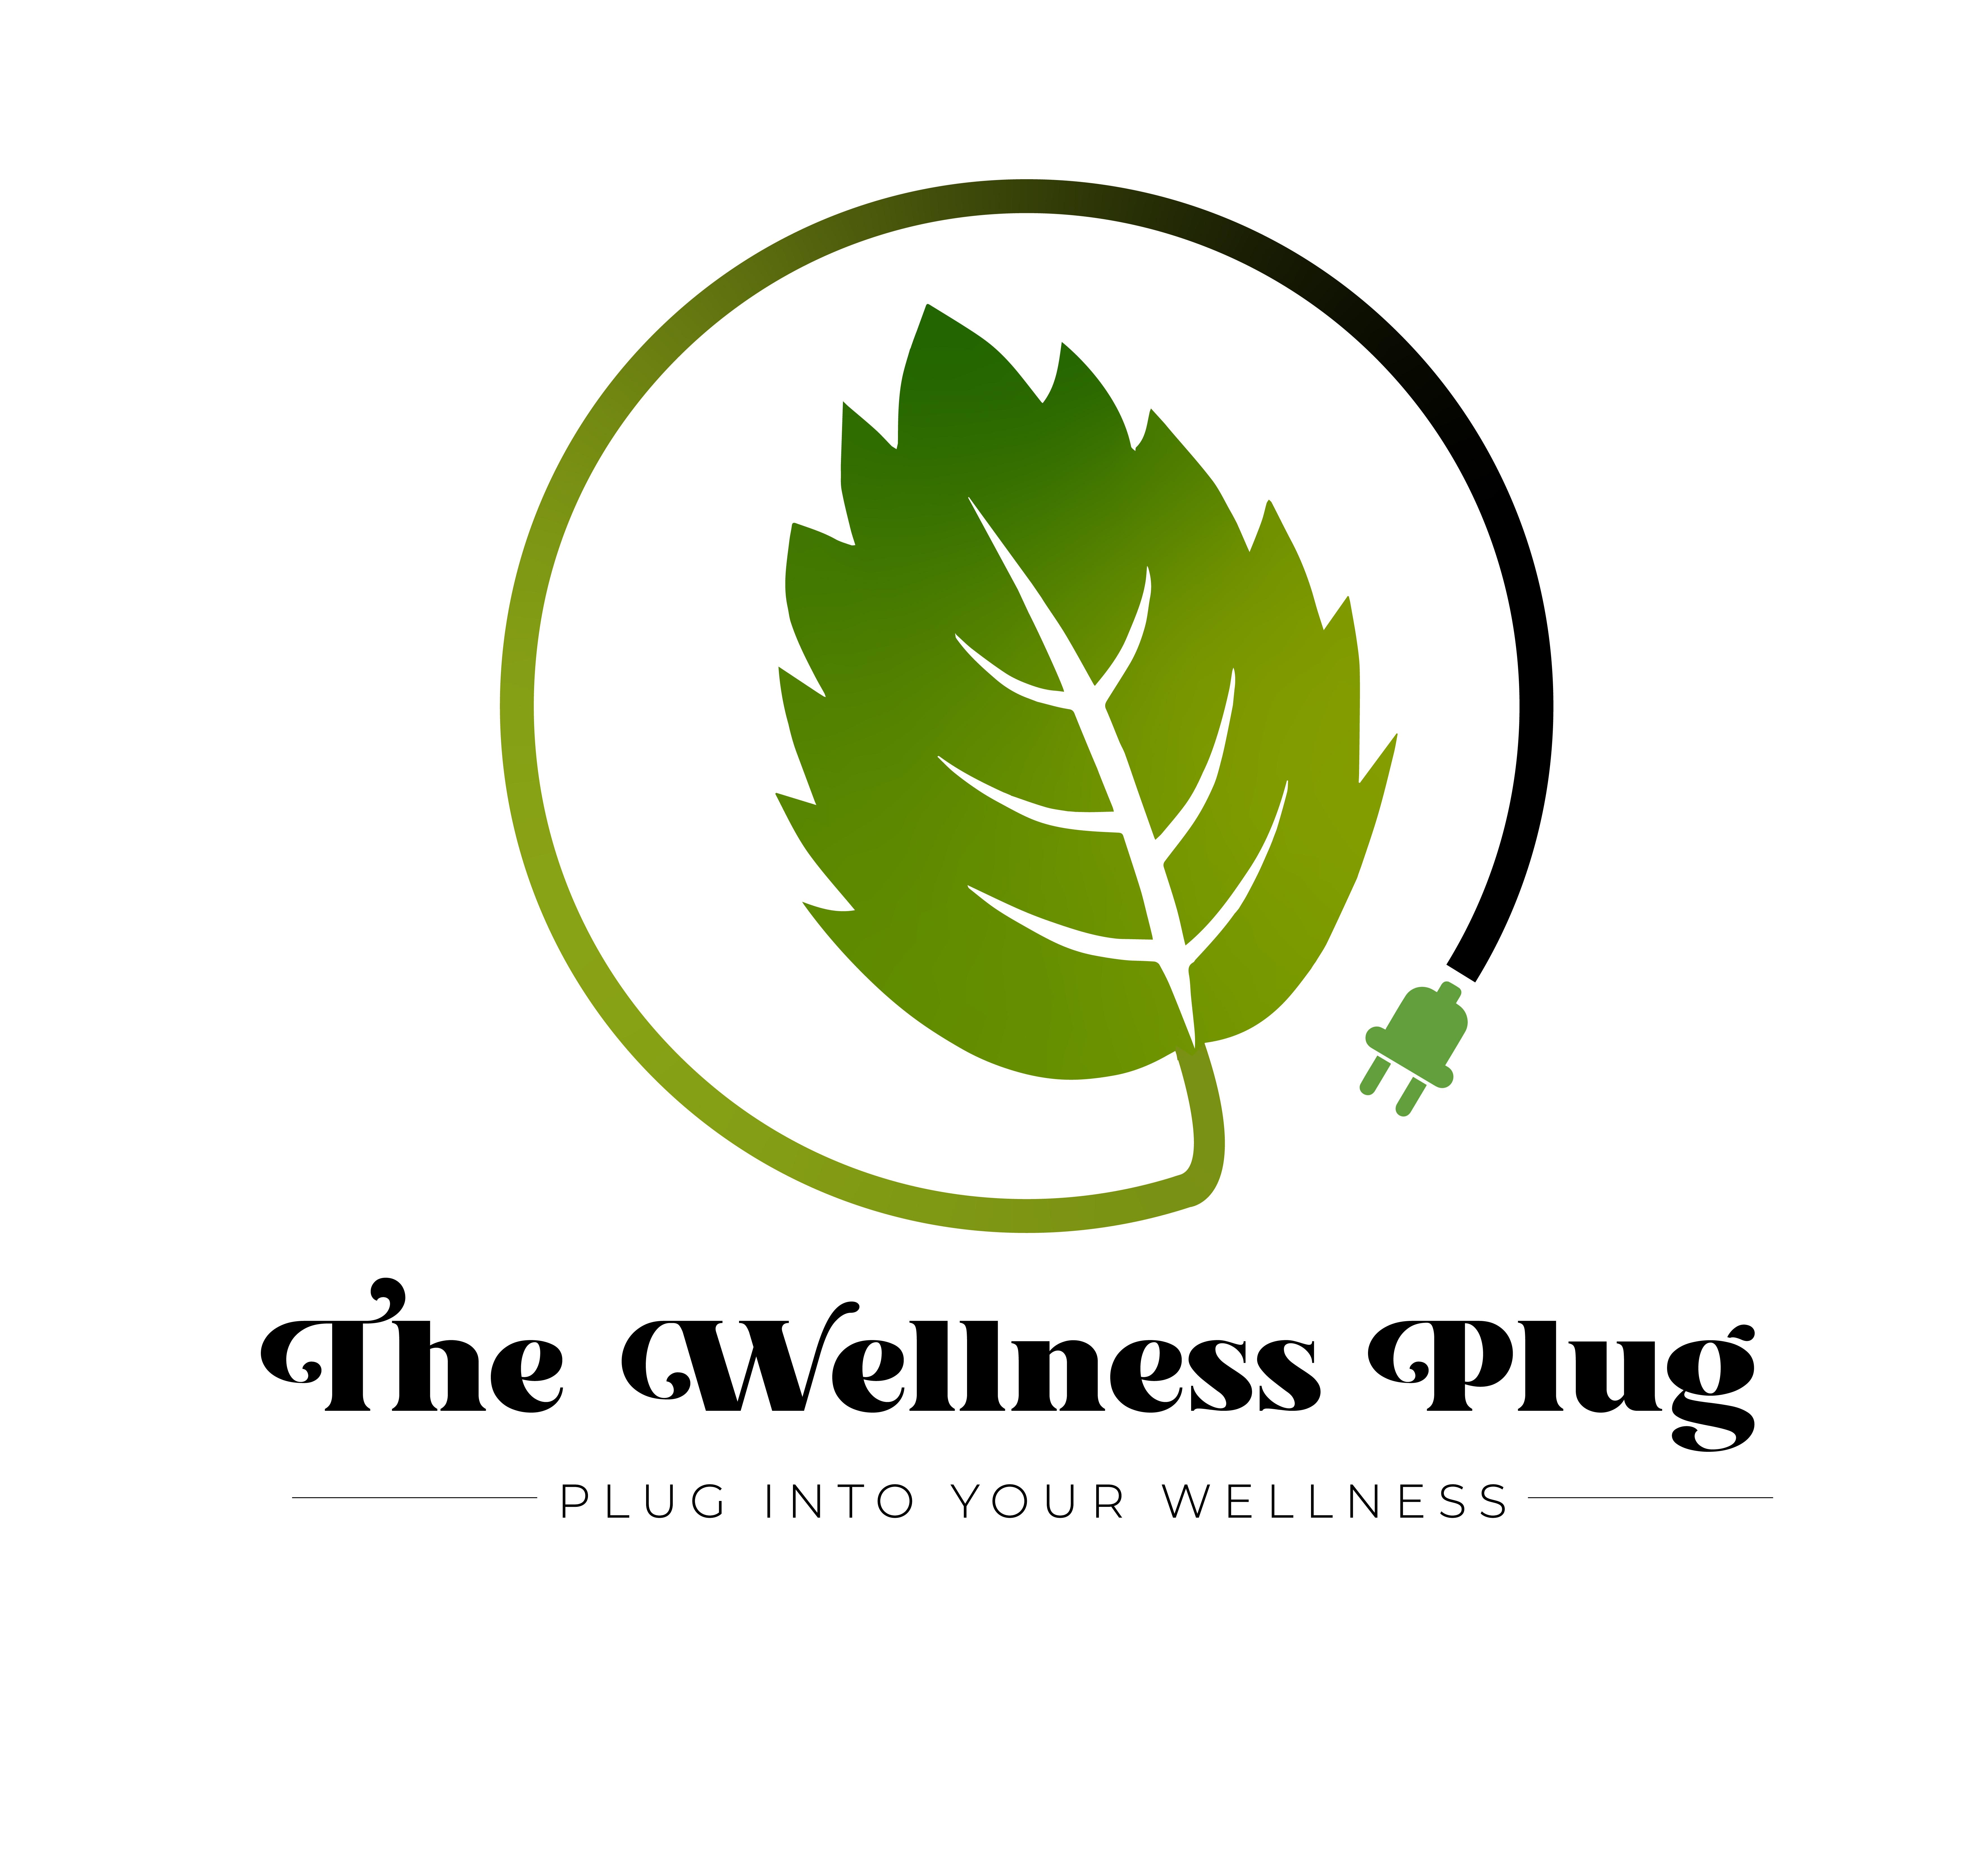 thewellness plug-01